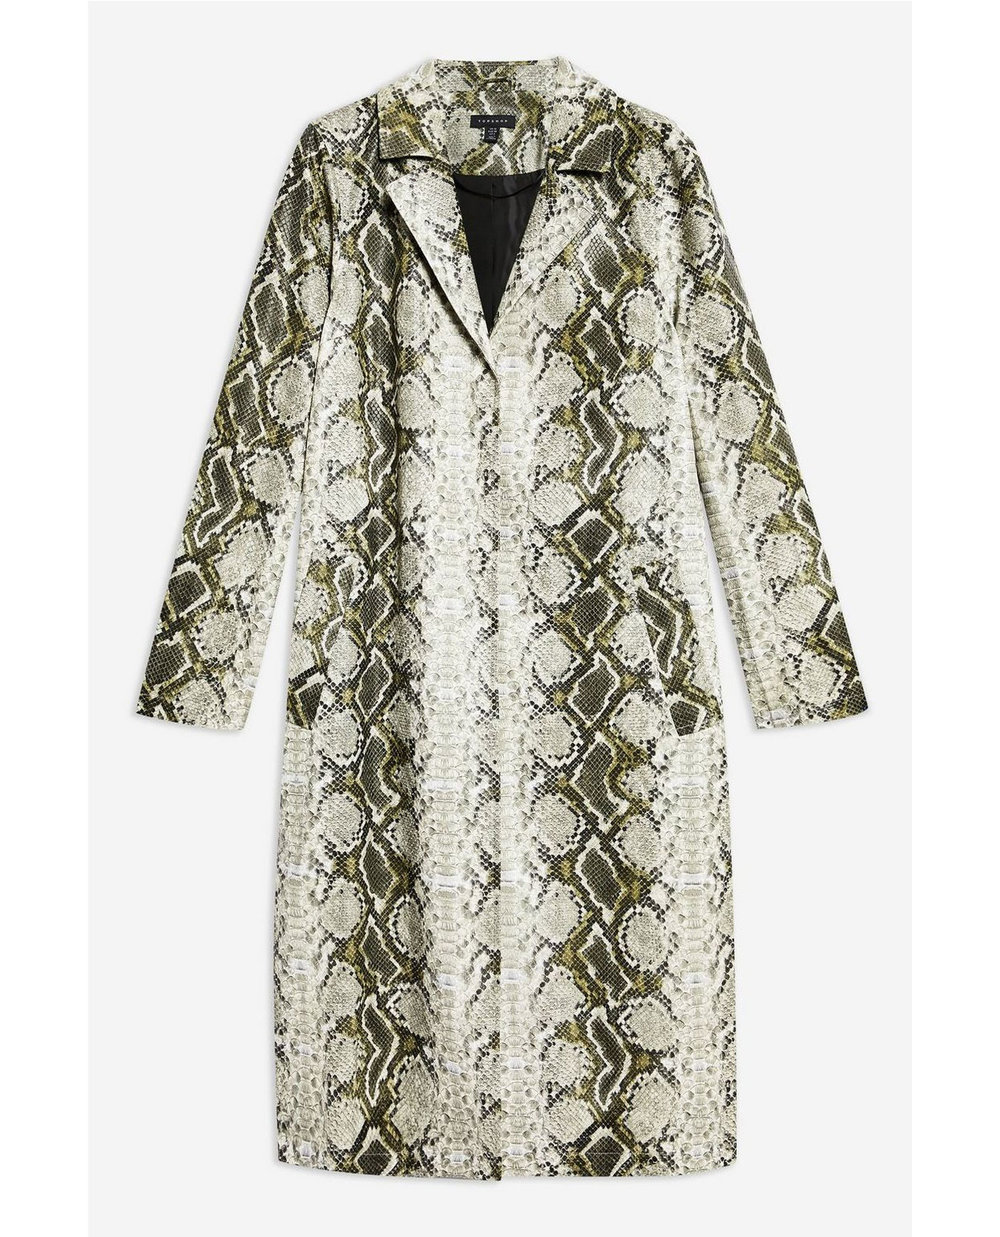 Top Shop Snake Print Coat     $160